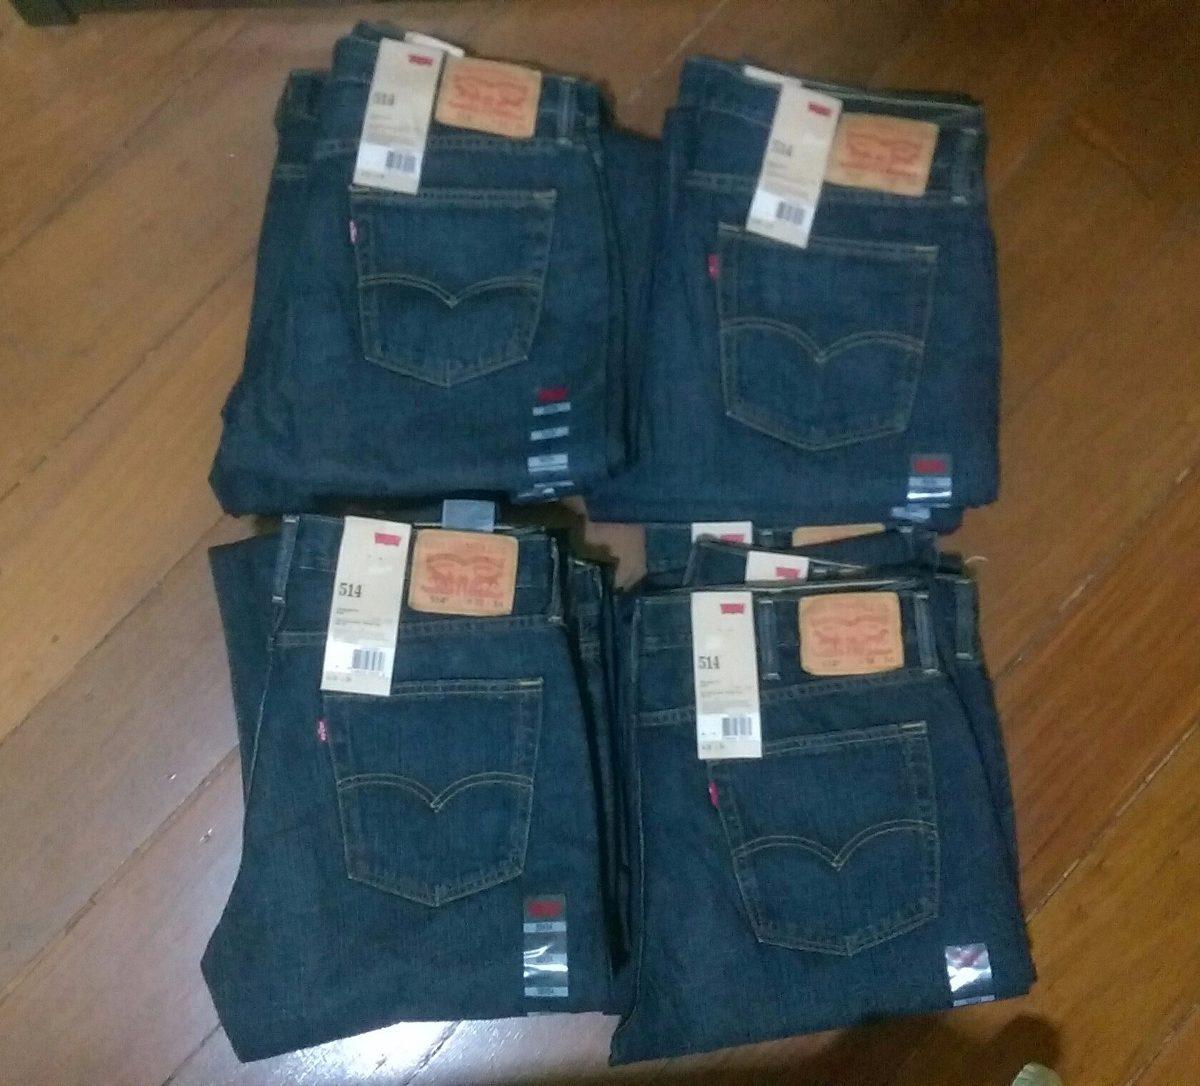 e8a1082a9 Levi´s 514 Jeans Azul Escuro Tradicional Reto Levis 501 - R$ 149,00 ...